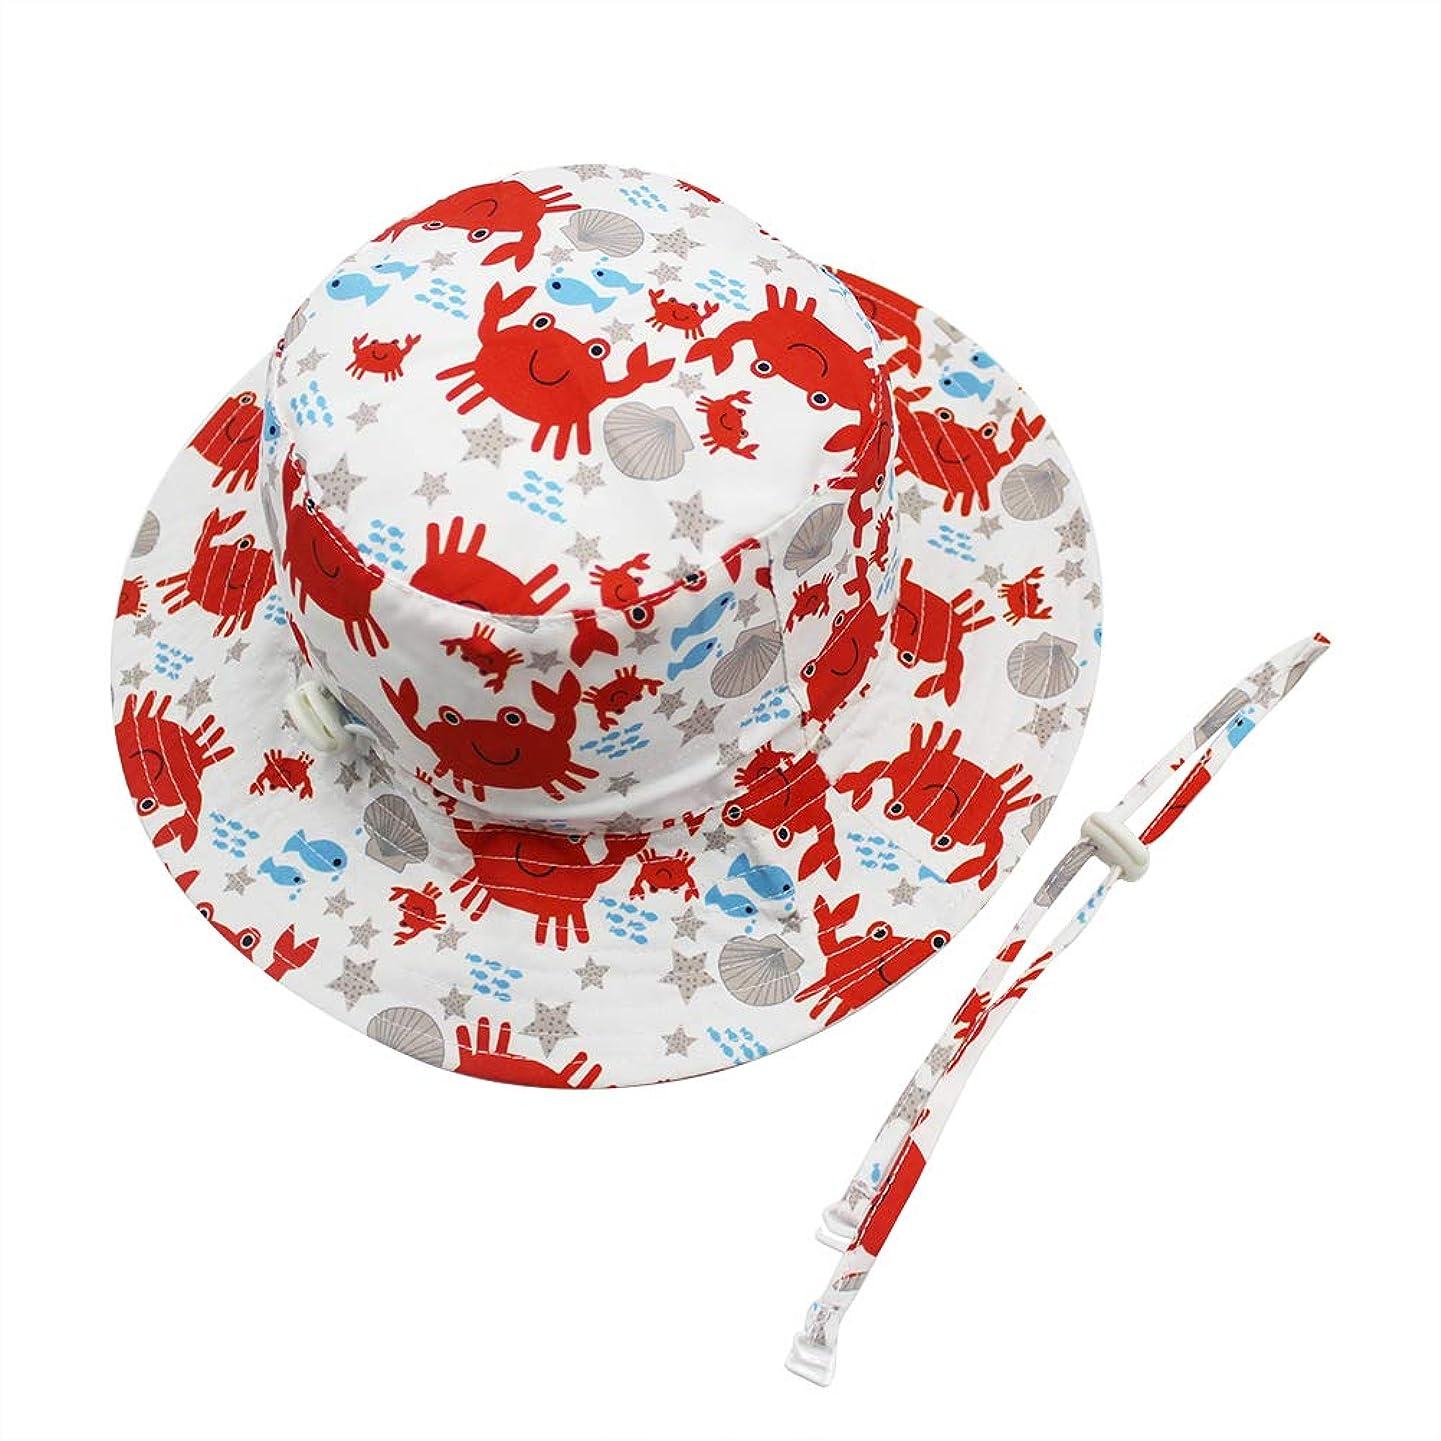 Kid Toddler Boys Girls Sun Hat UPF 50+Adjustable Outdoor Beach Bucket hat Chin Strap